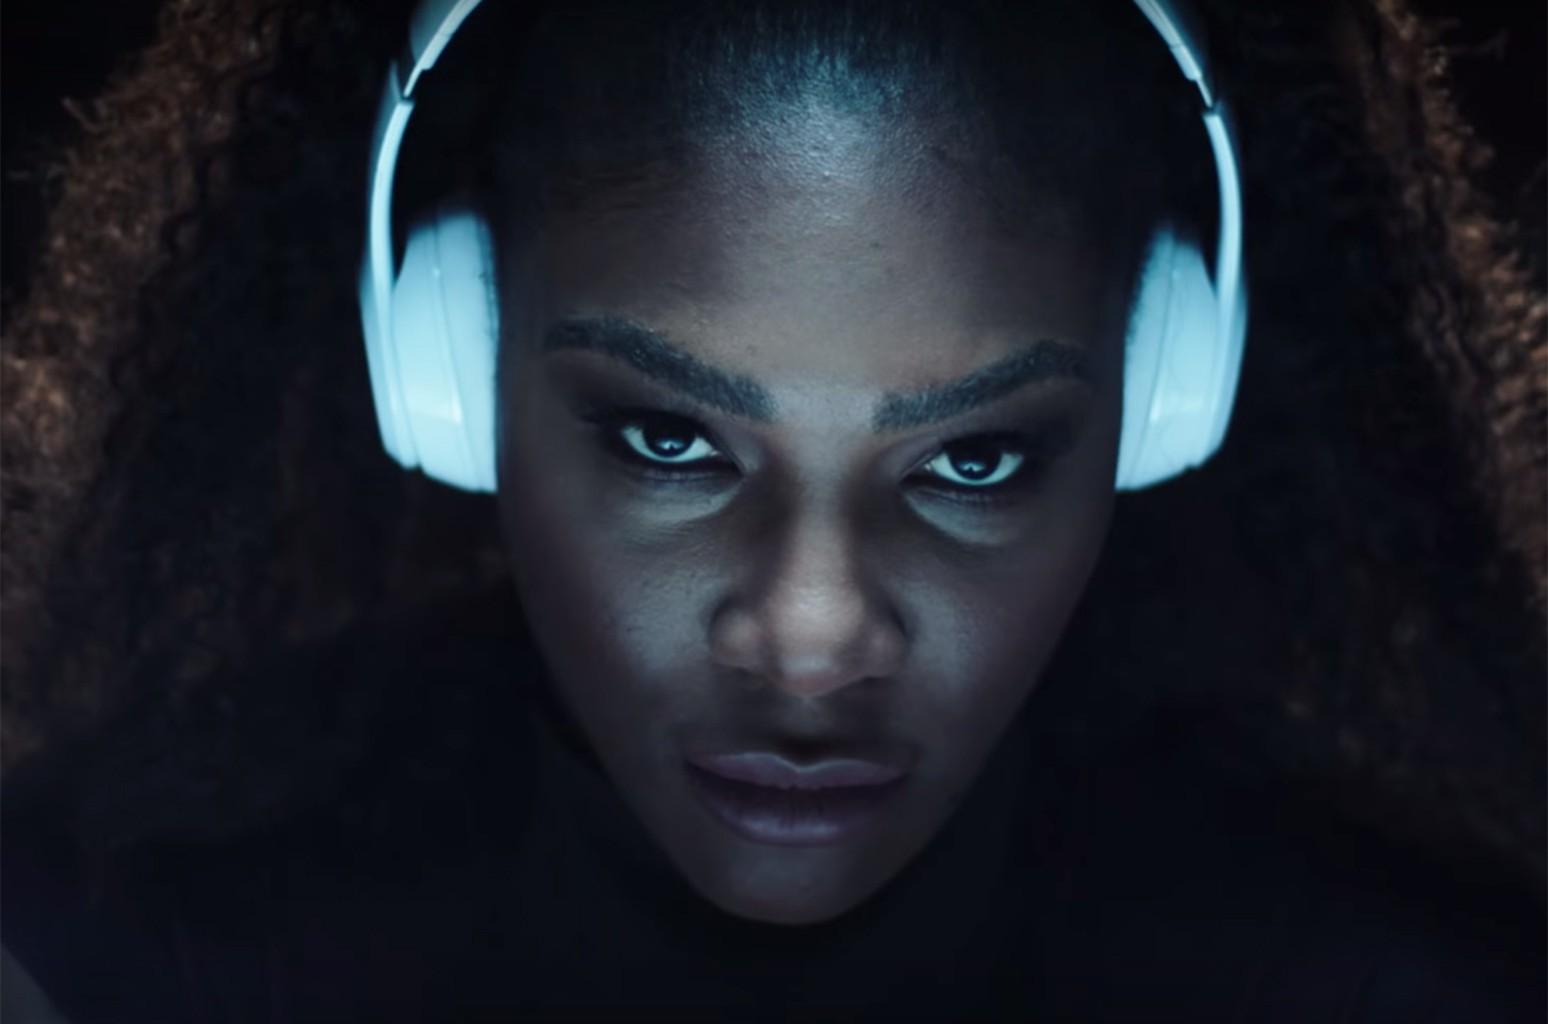 Beats By Dre Presents: BE HEARD